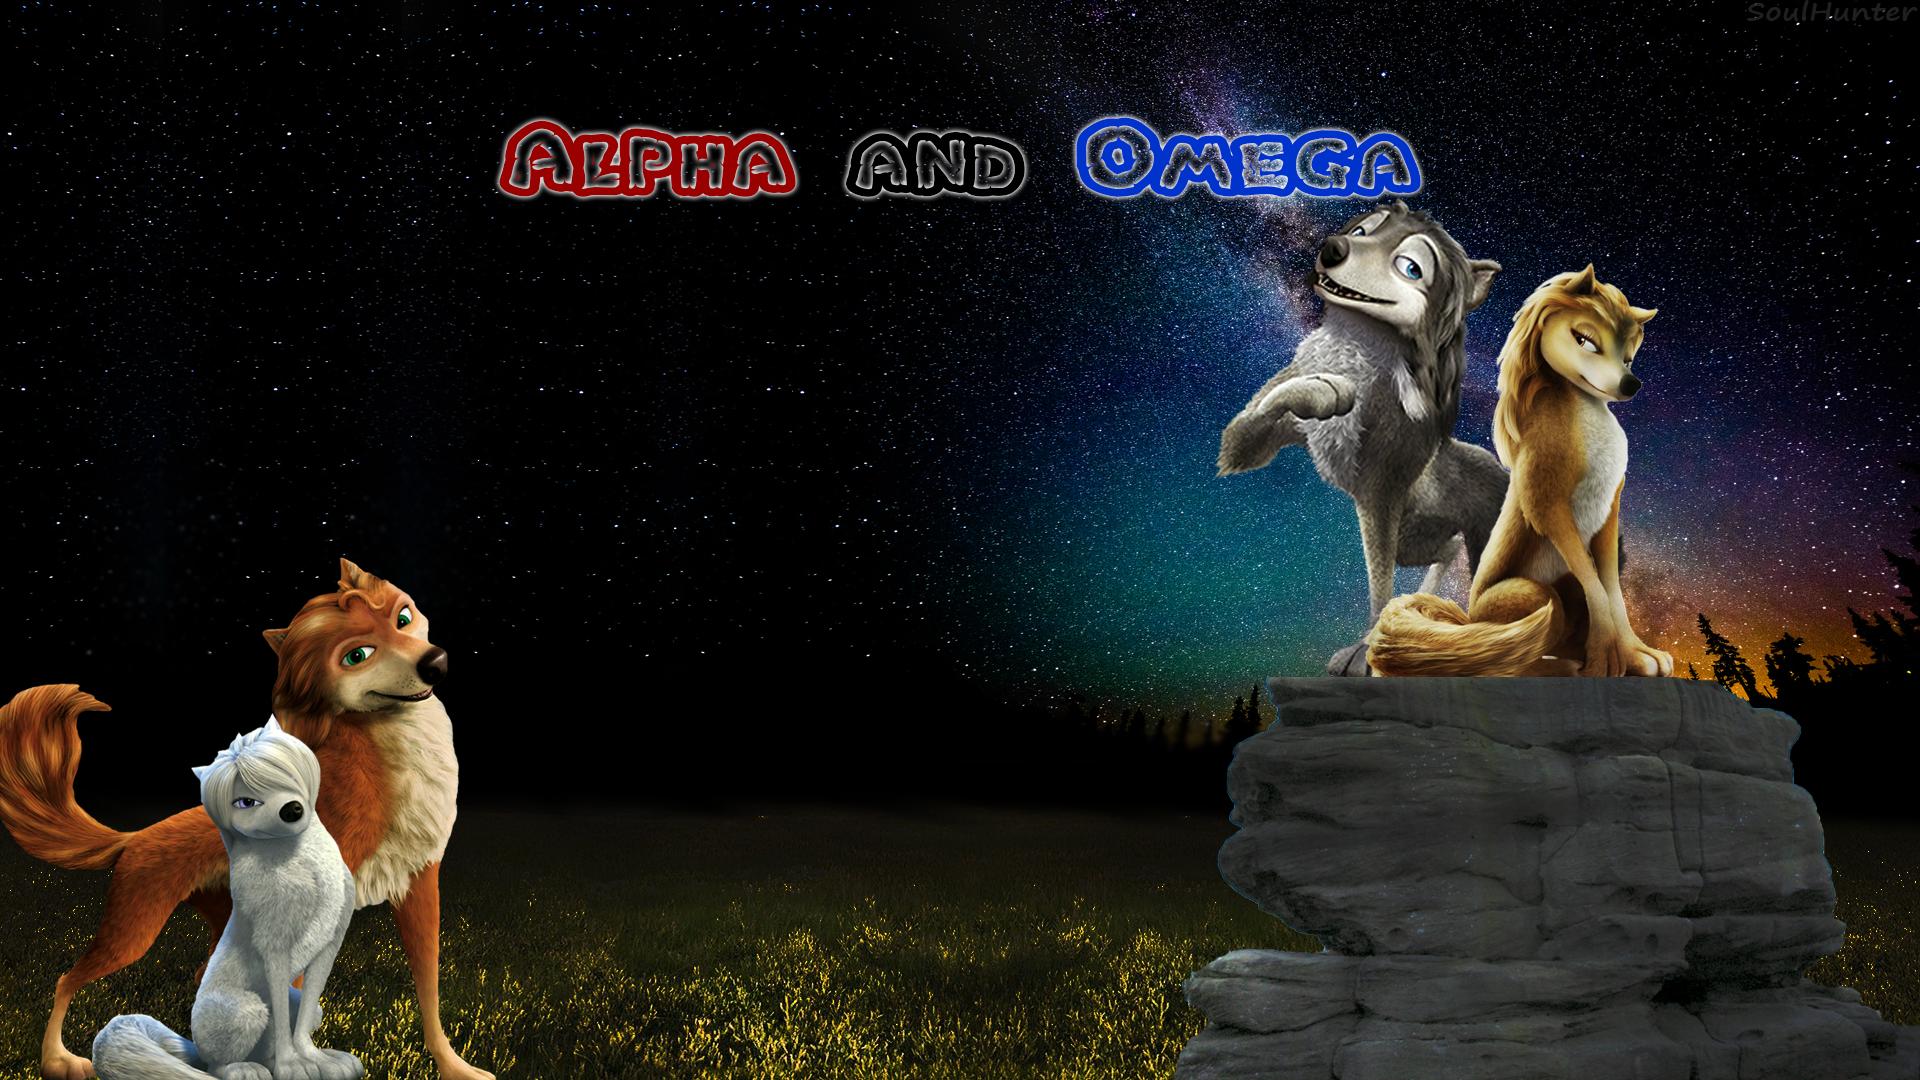 Alpha and Omega Wallpaper - Alpha and Omega Wallpaper (39379908 ...